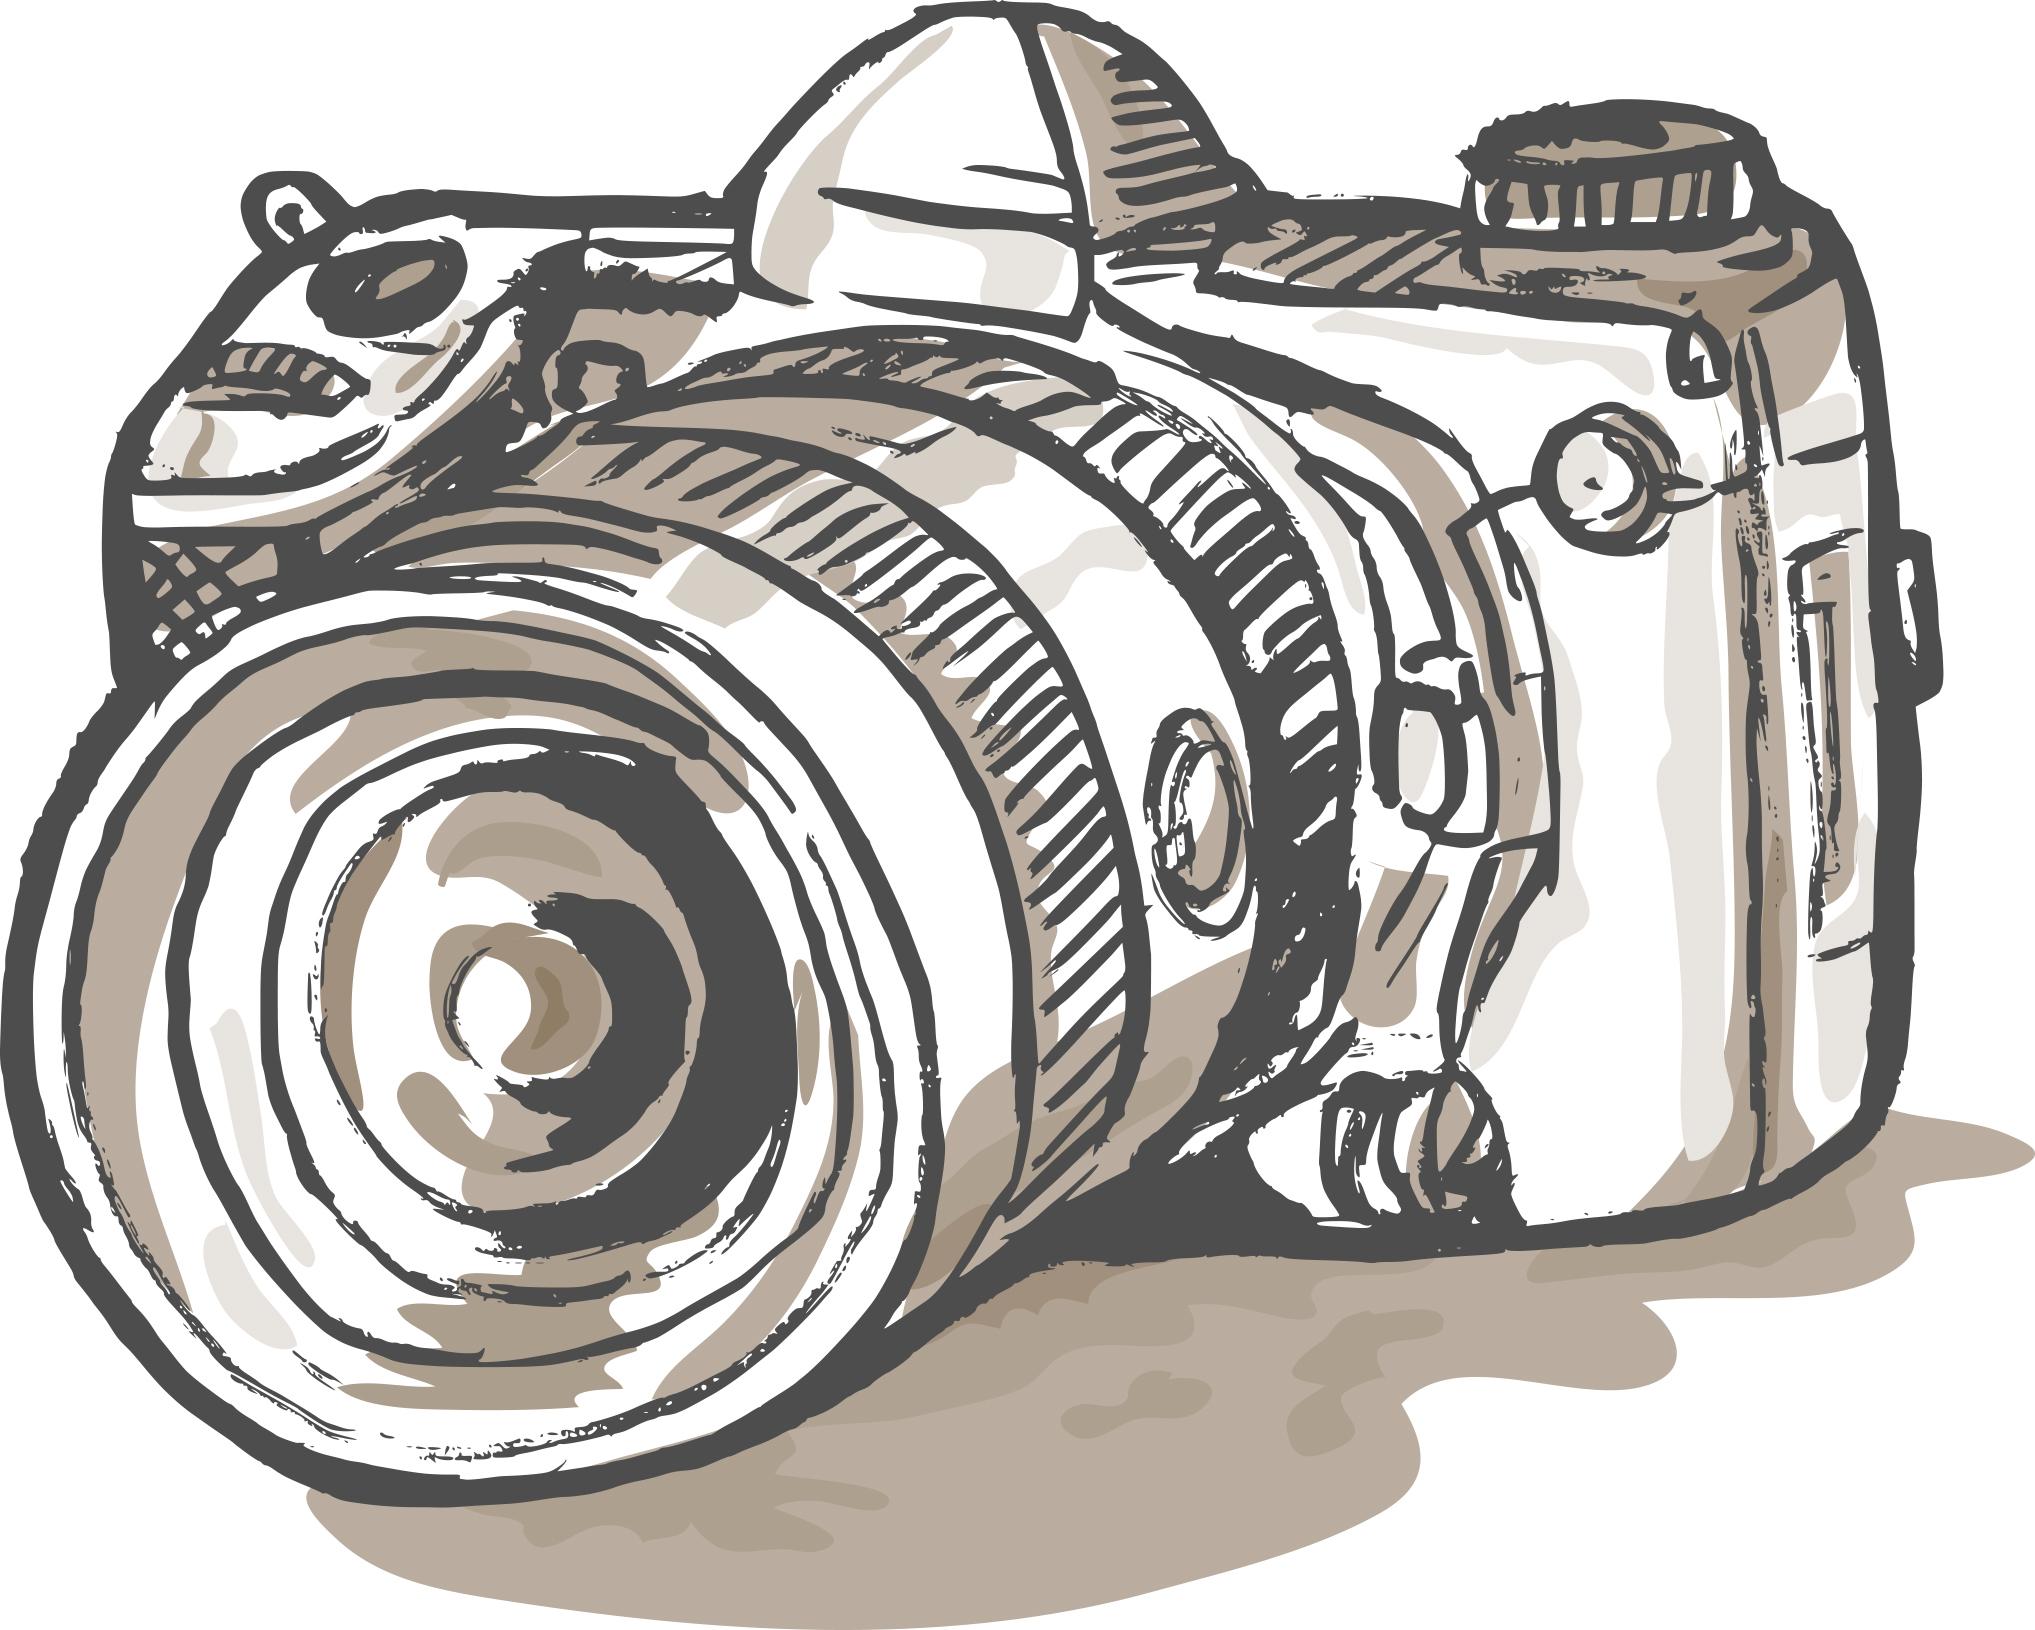 NX_camera_dslr_sktch.jpg.